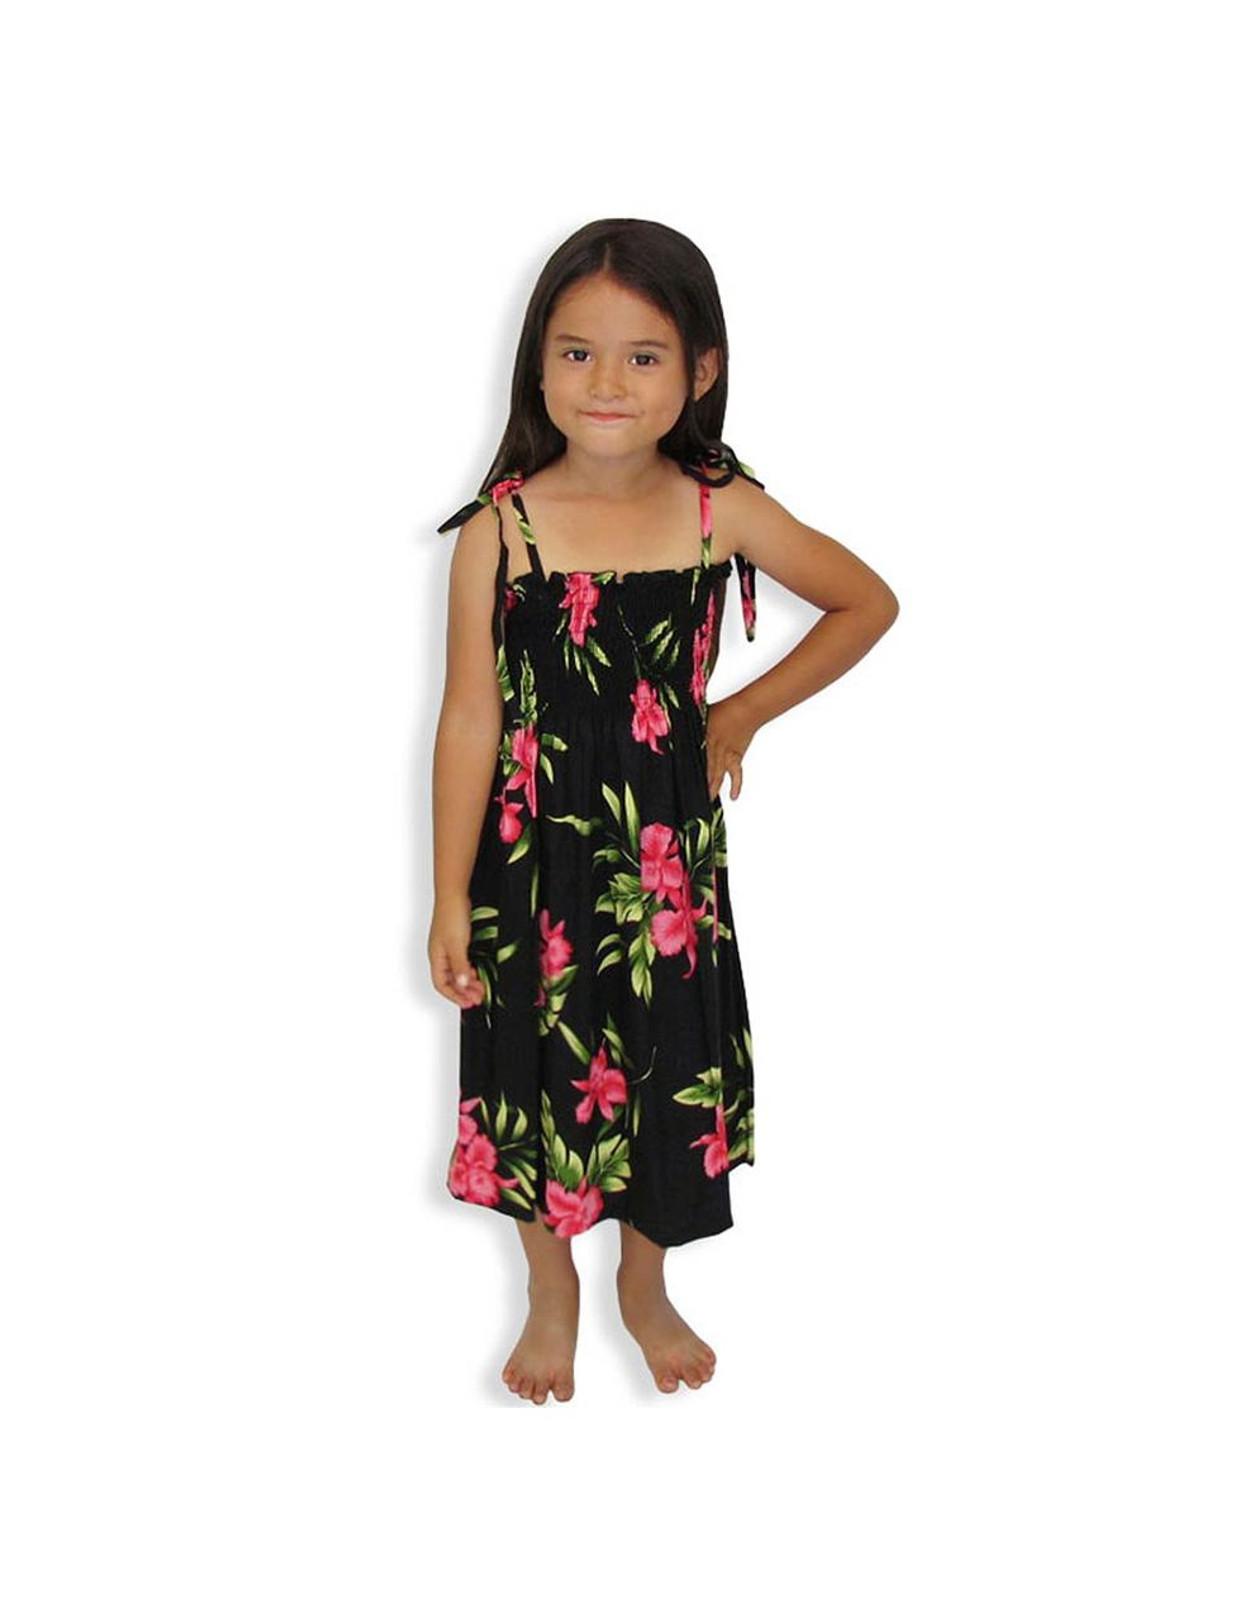 8aa4740073dd Okalani - Smocked Girls Tube Top Dress 100% Rayon Color: Black One Size fits